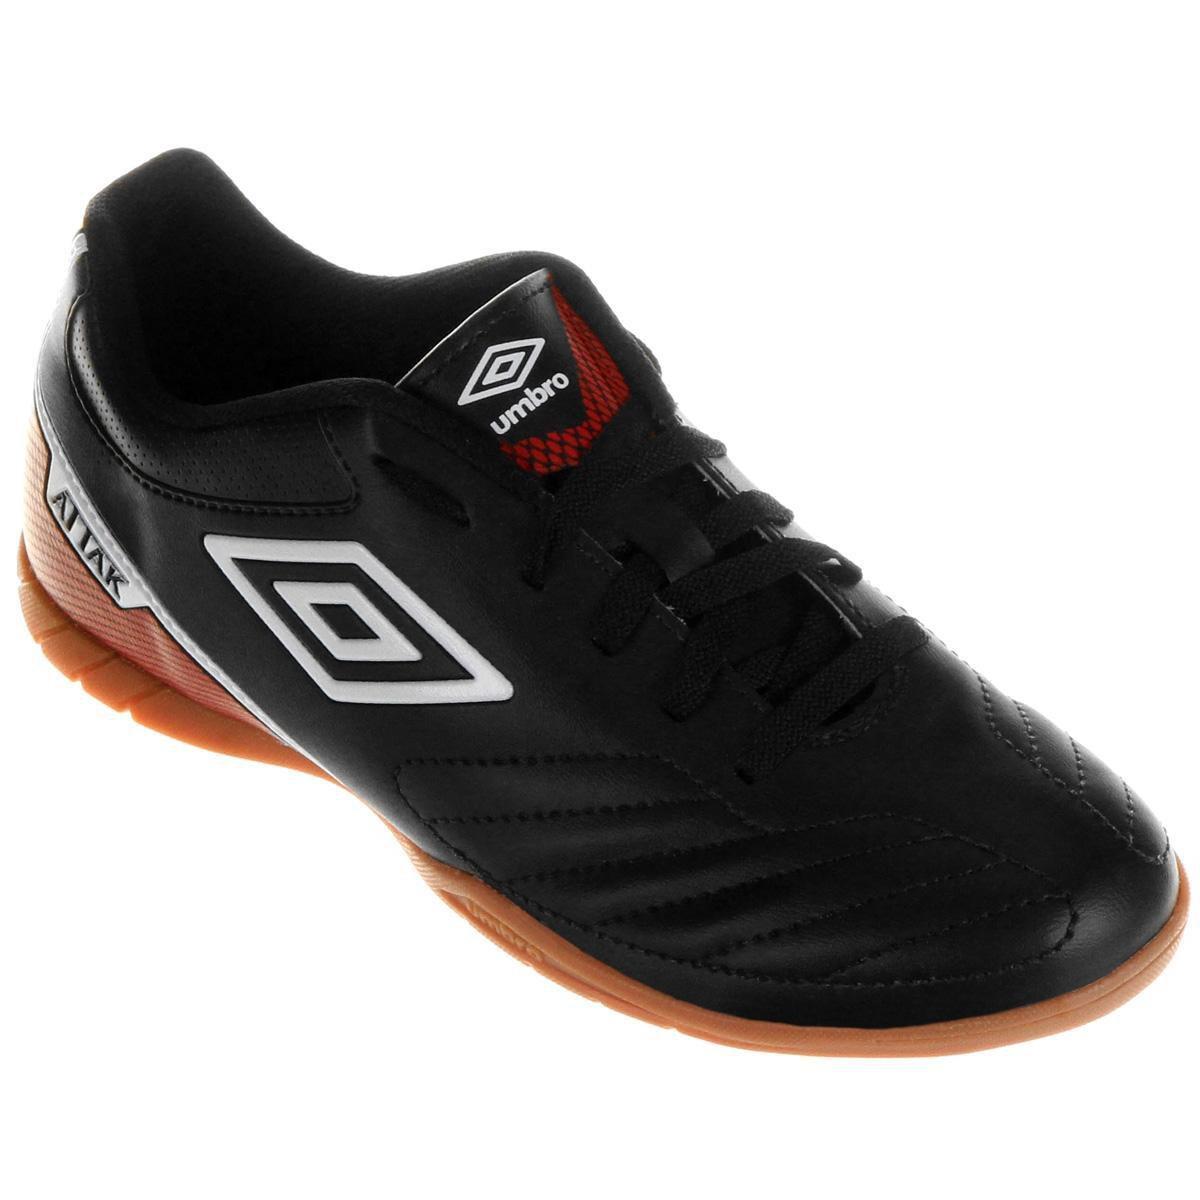 Chuteira Futsal Umbro Attak 2 - Compre Agora  7a9a2989118f7